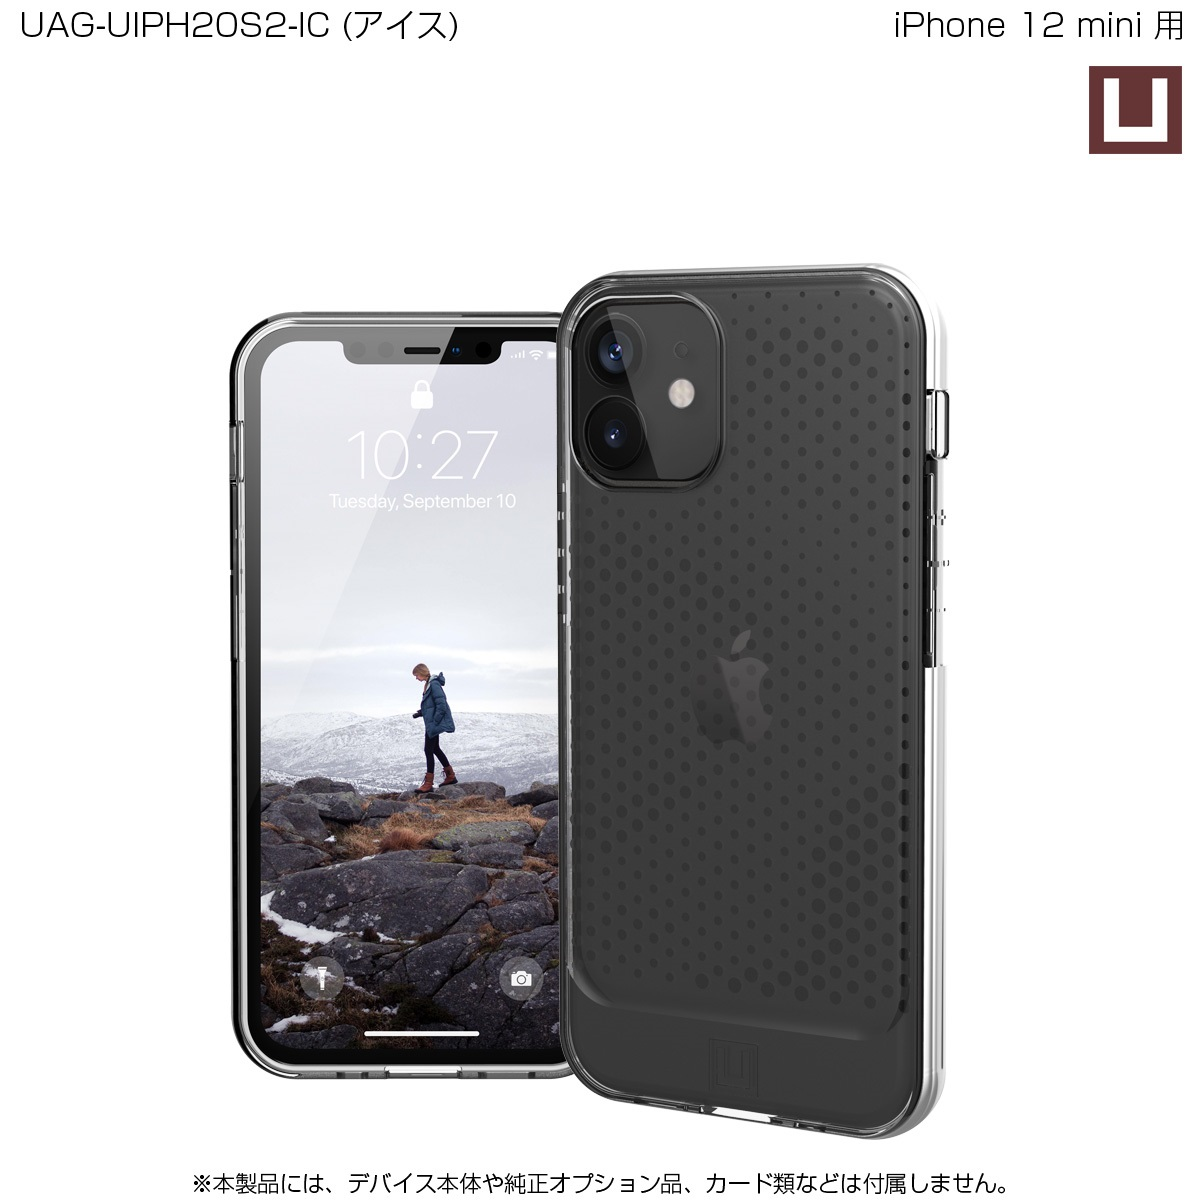 U by UAG iPhone 12 mini用 LUCENTケース 全4色 耐衝撃 UAG-UIPH20S2シリーズ 5.4インチ